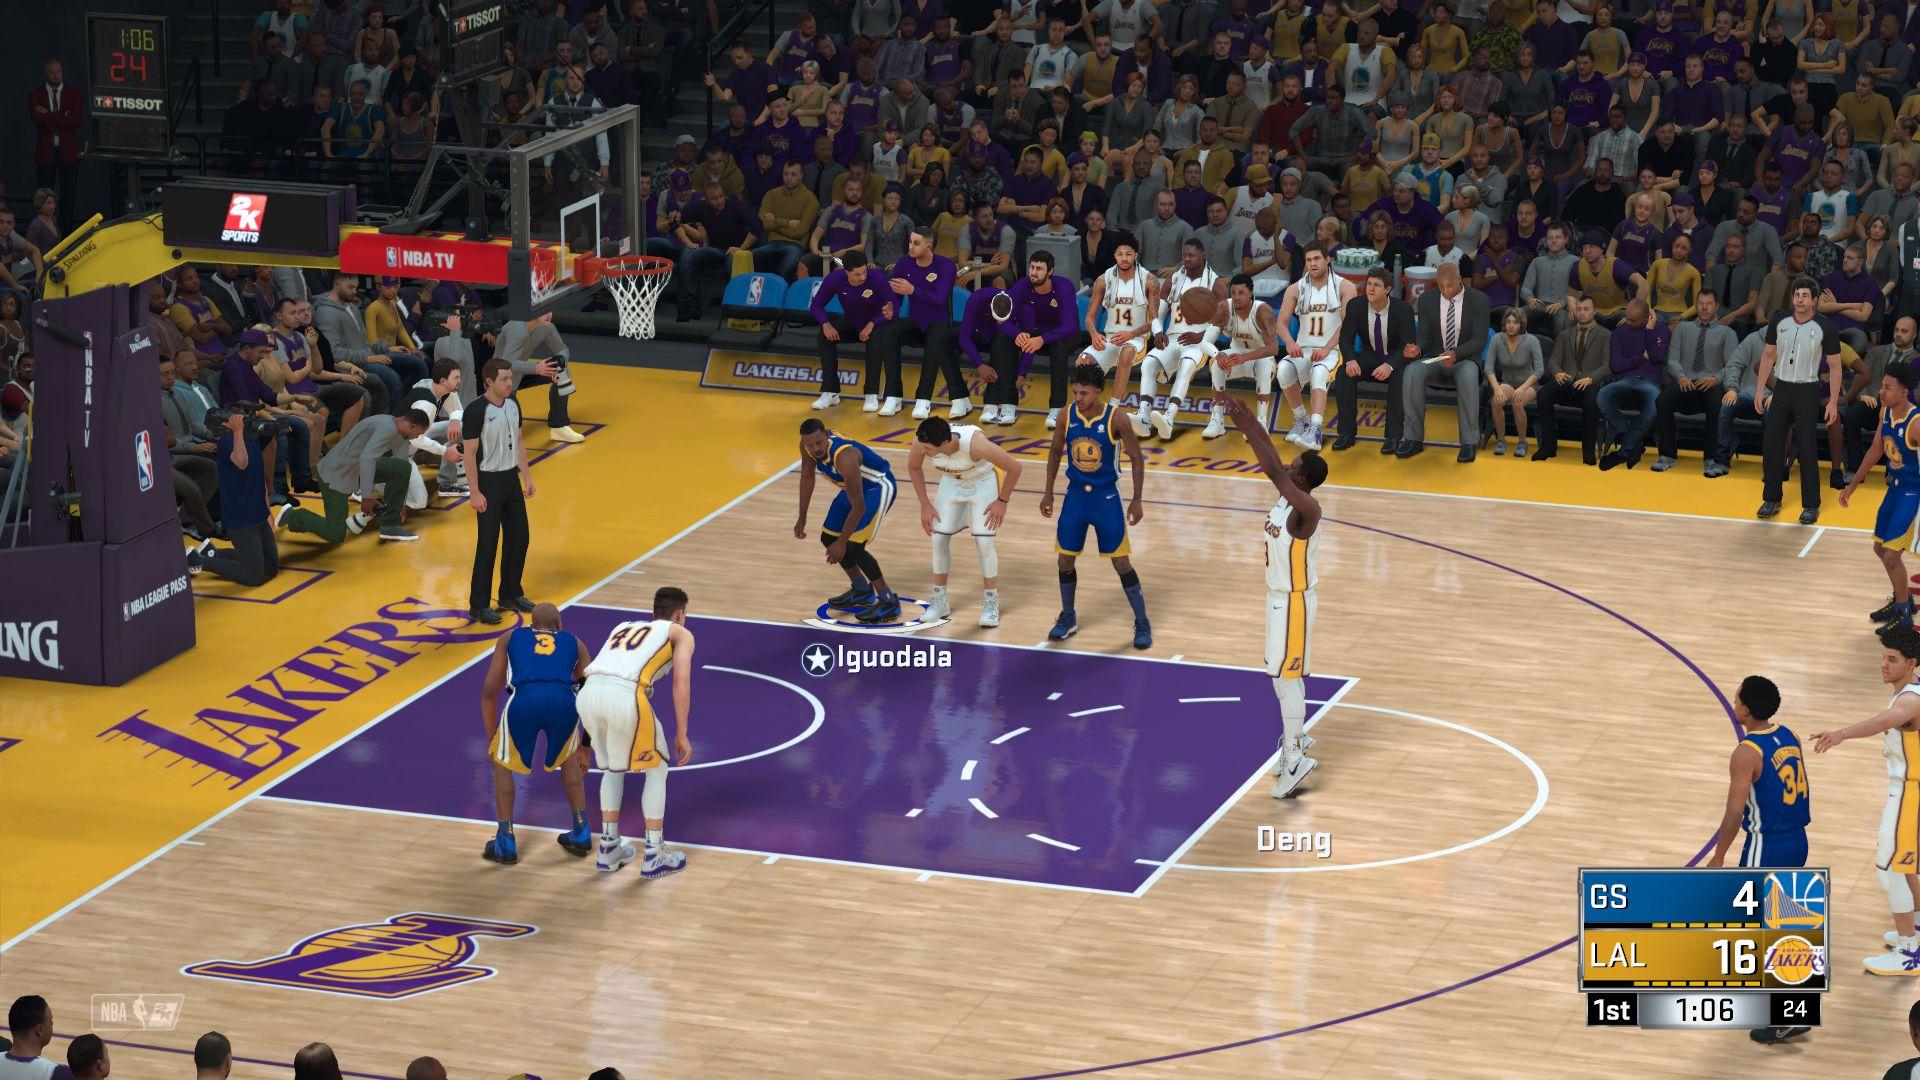 NBA 2K18 – basketbal s prvky MMO 151751